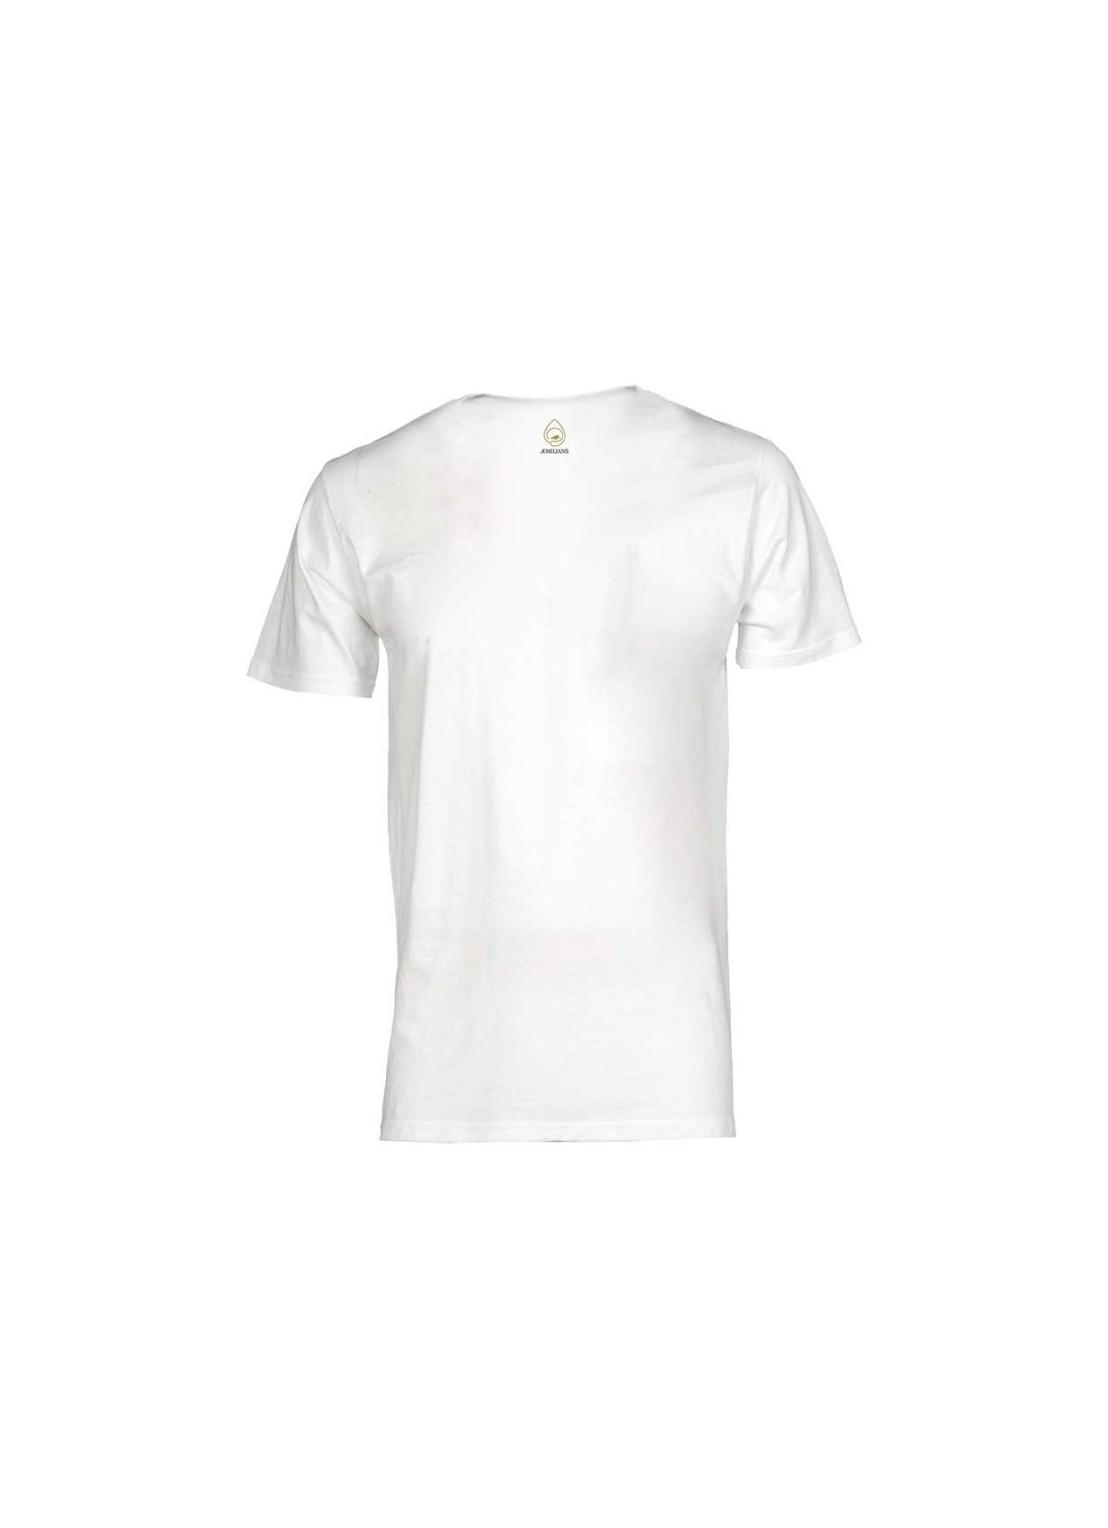 "T-shirt ""Non l'hai mica capito"" unisex bianca"